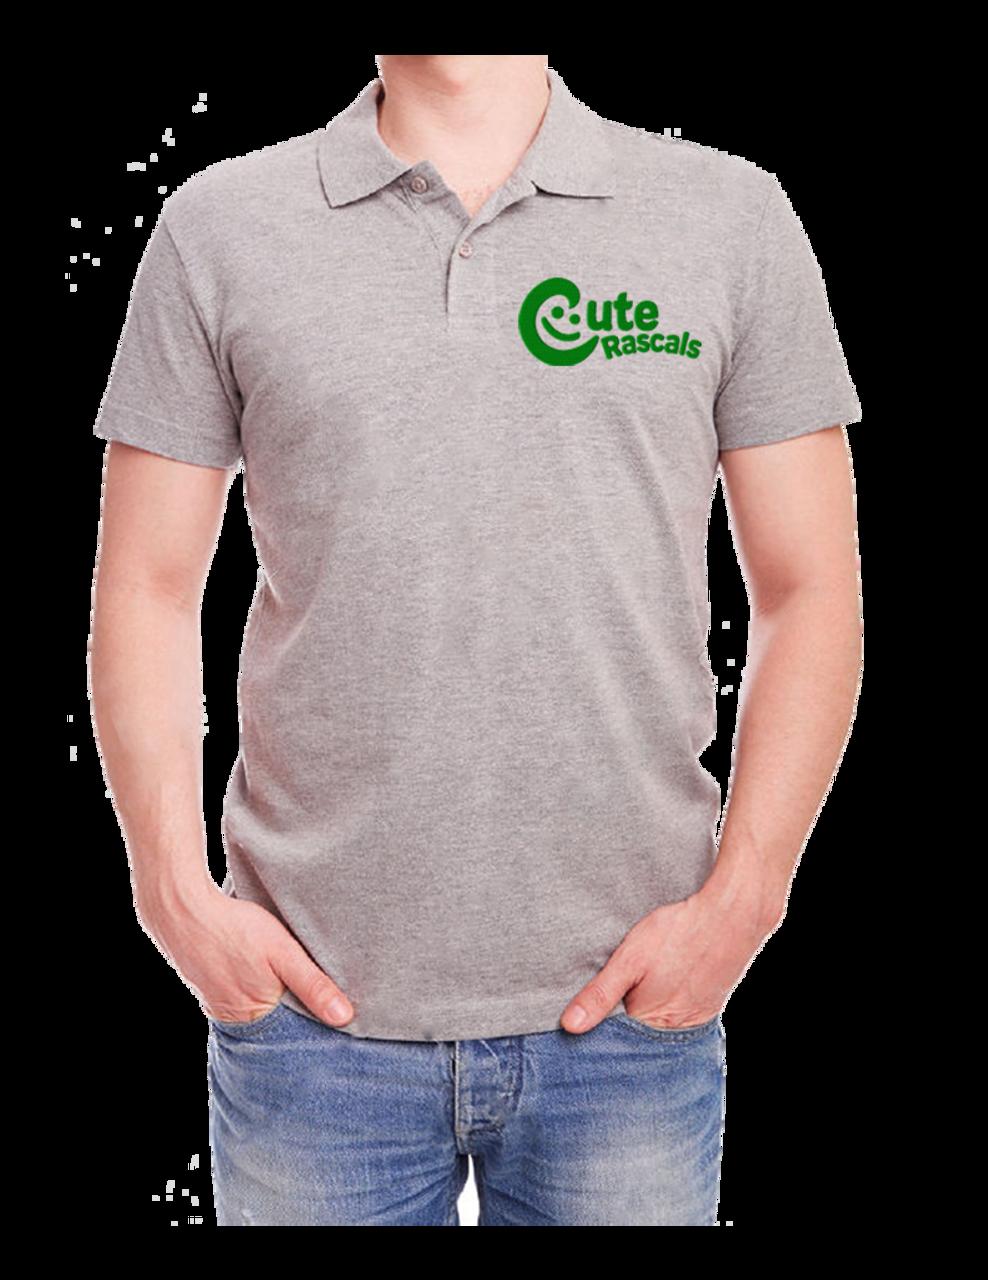 Custom Military Polo Shirts – EDGE Engineering and